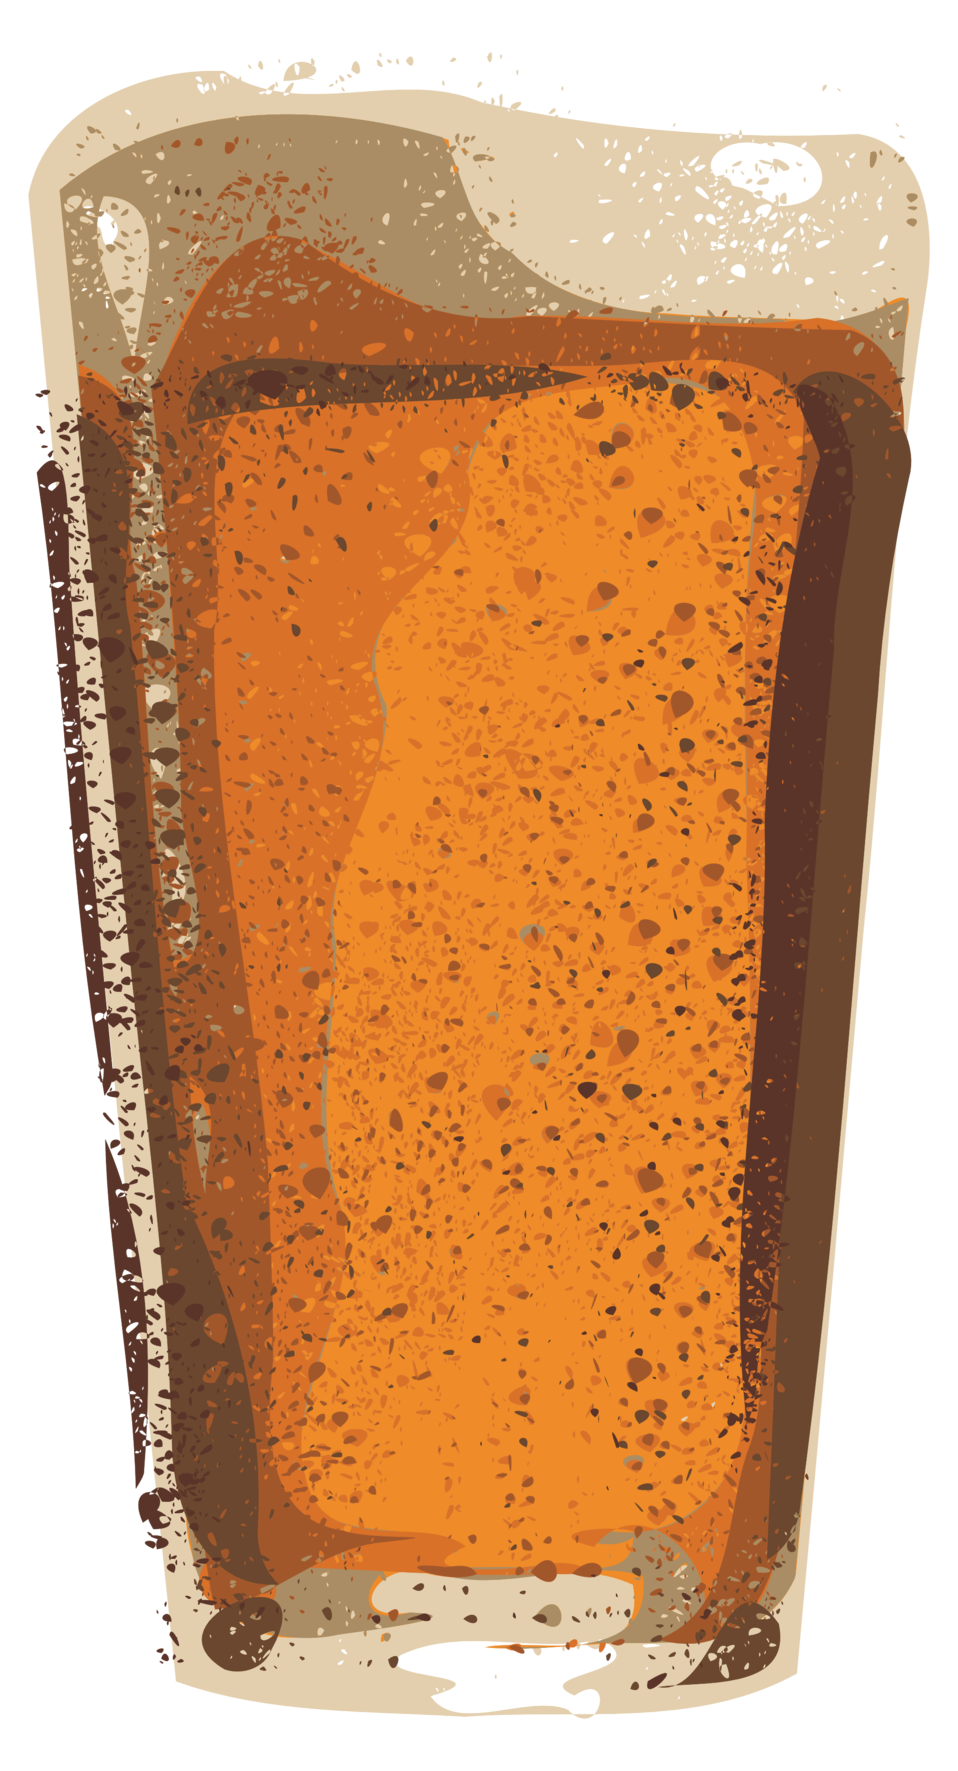 Public domain clip art. Drinking clipart pint glass